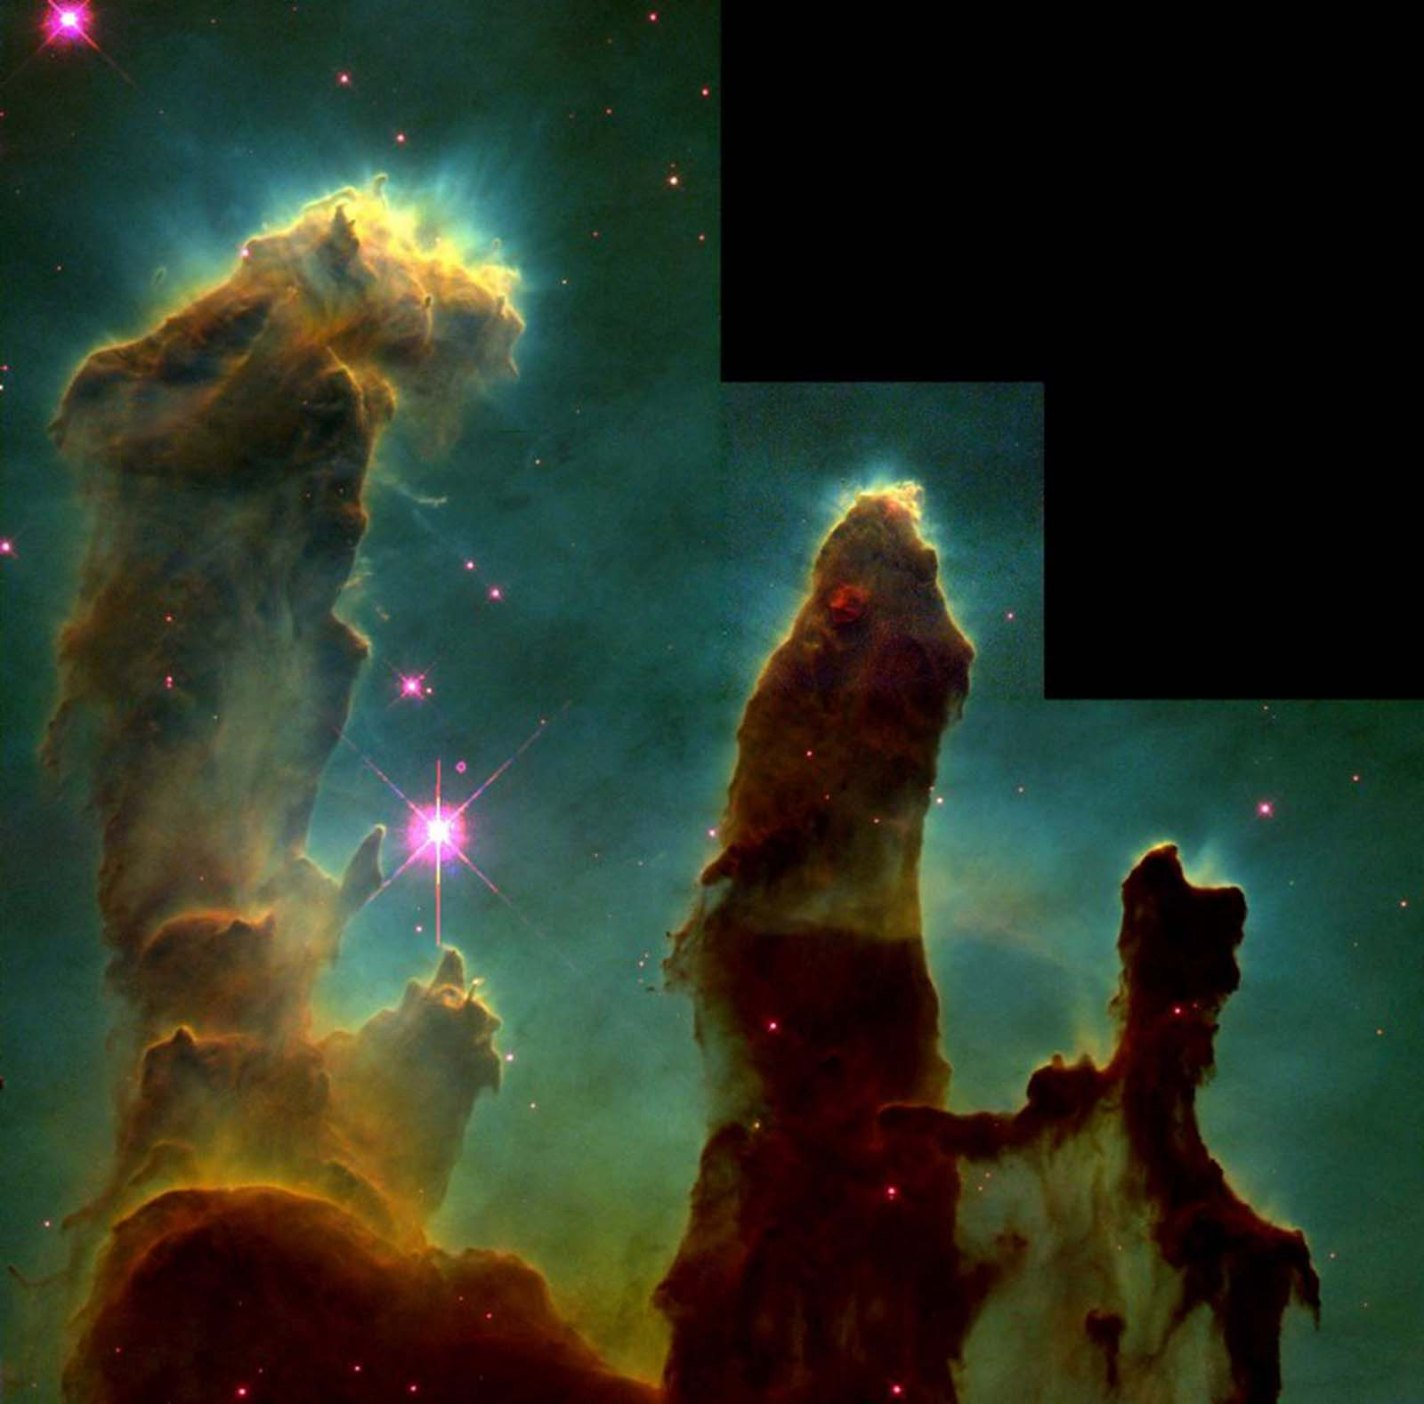 Pillars of Creation, NASA, 1995